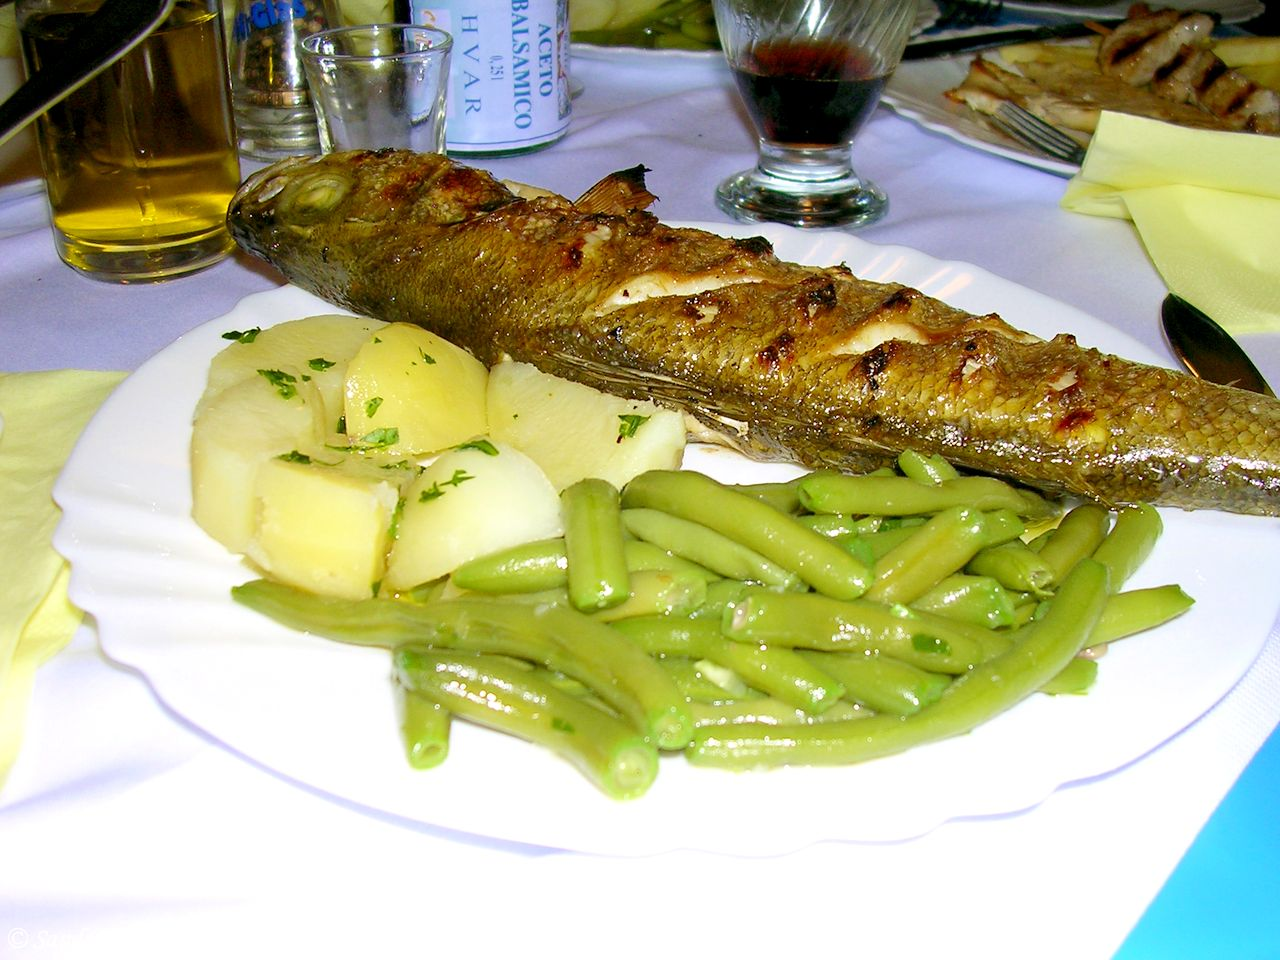 Croatia - Hvar seafood feast